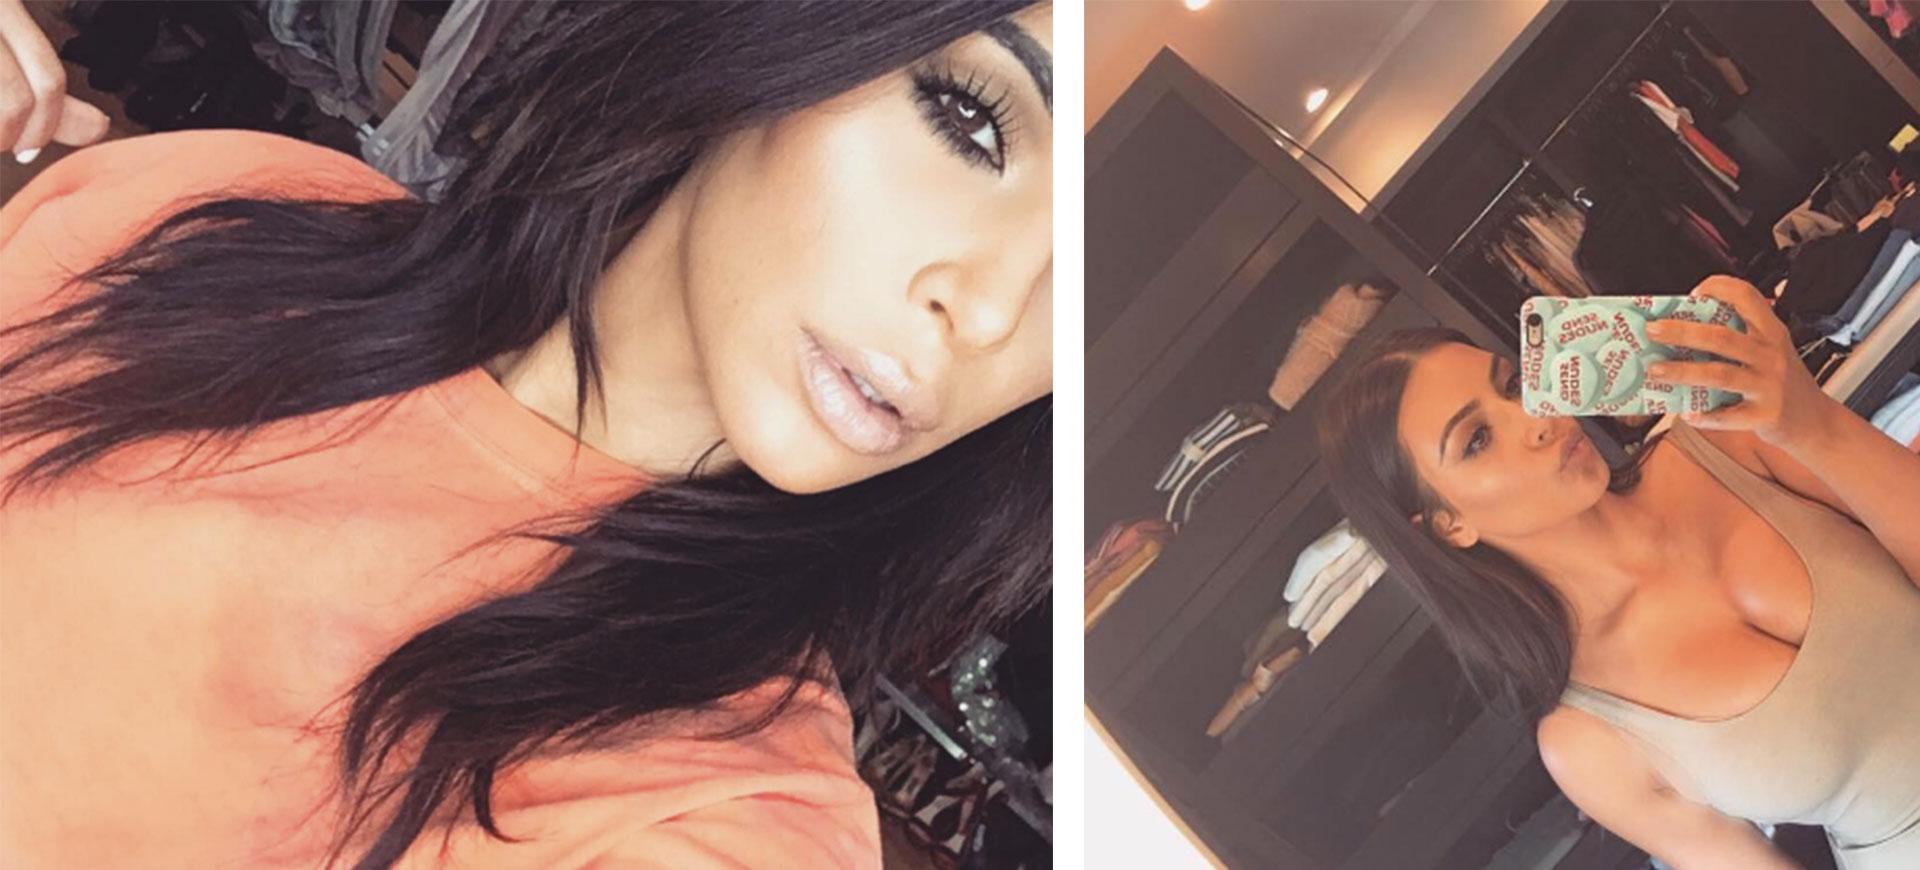 kim kardashian rånad på hotellrum i paris